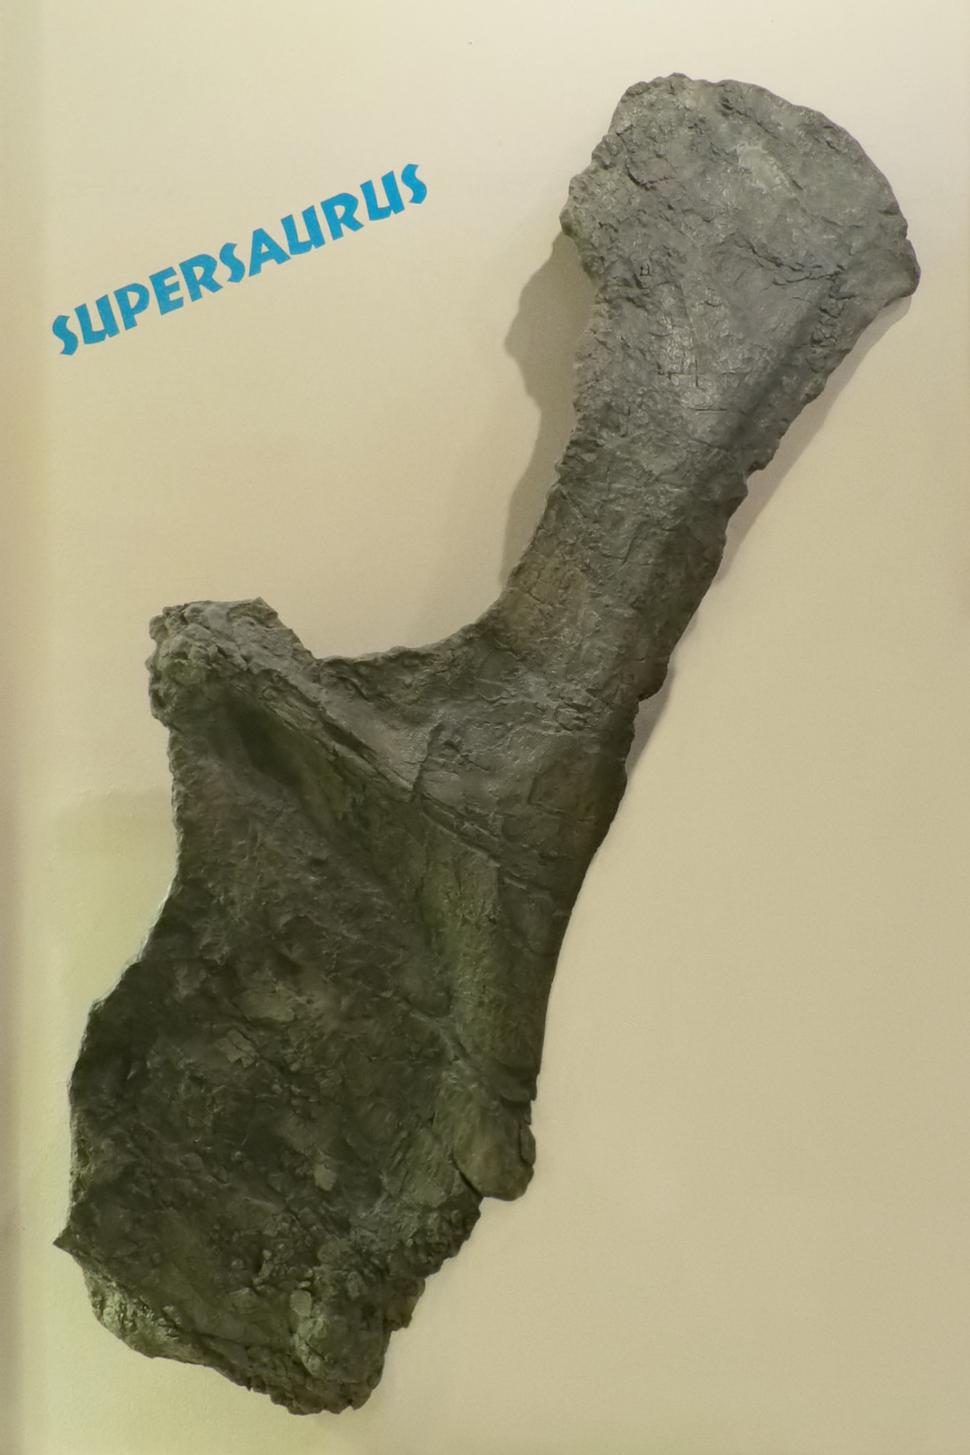 Supersaurus-Holotype-BYU9025-PerspectiveWarp